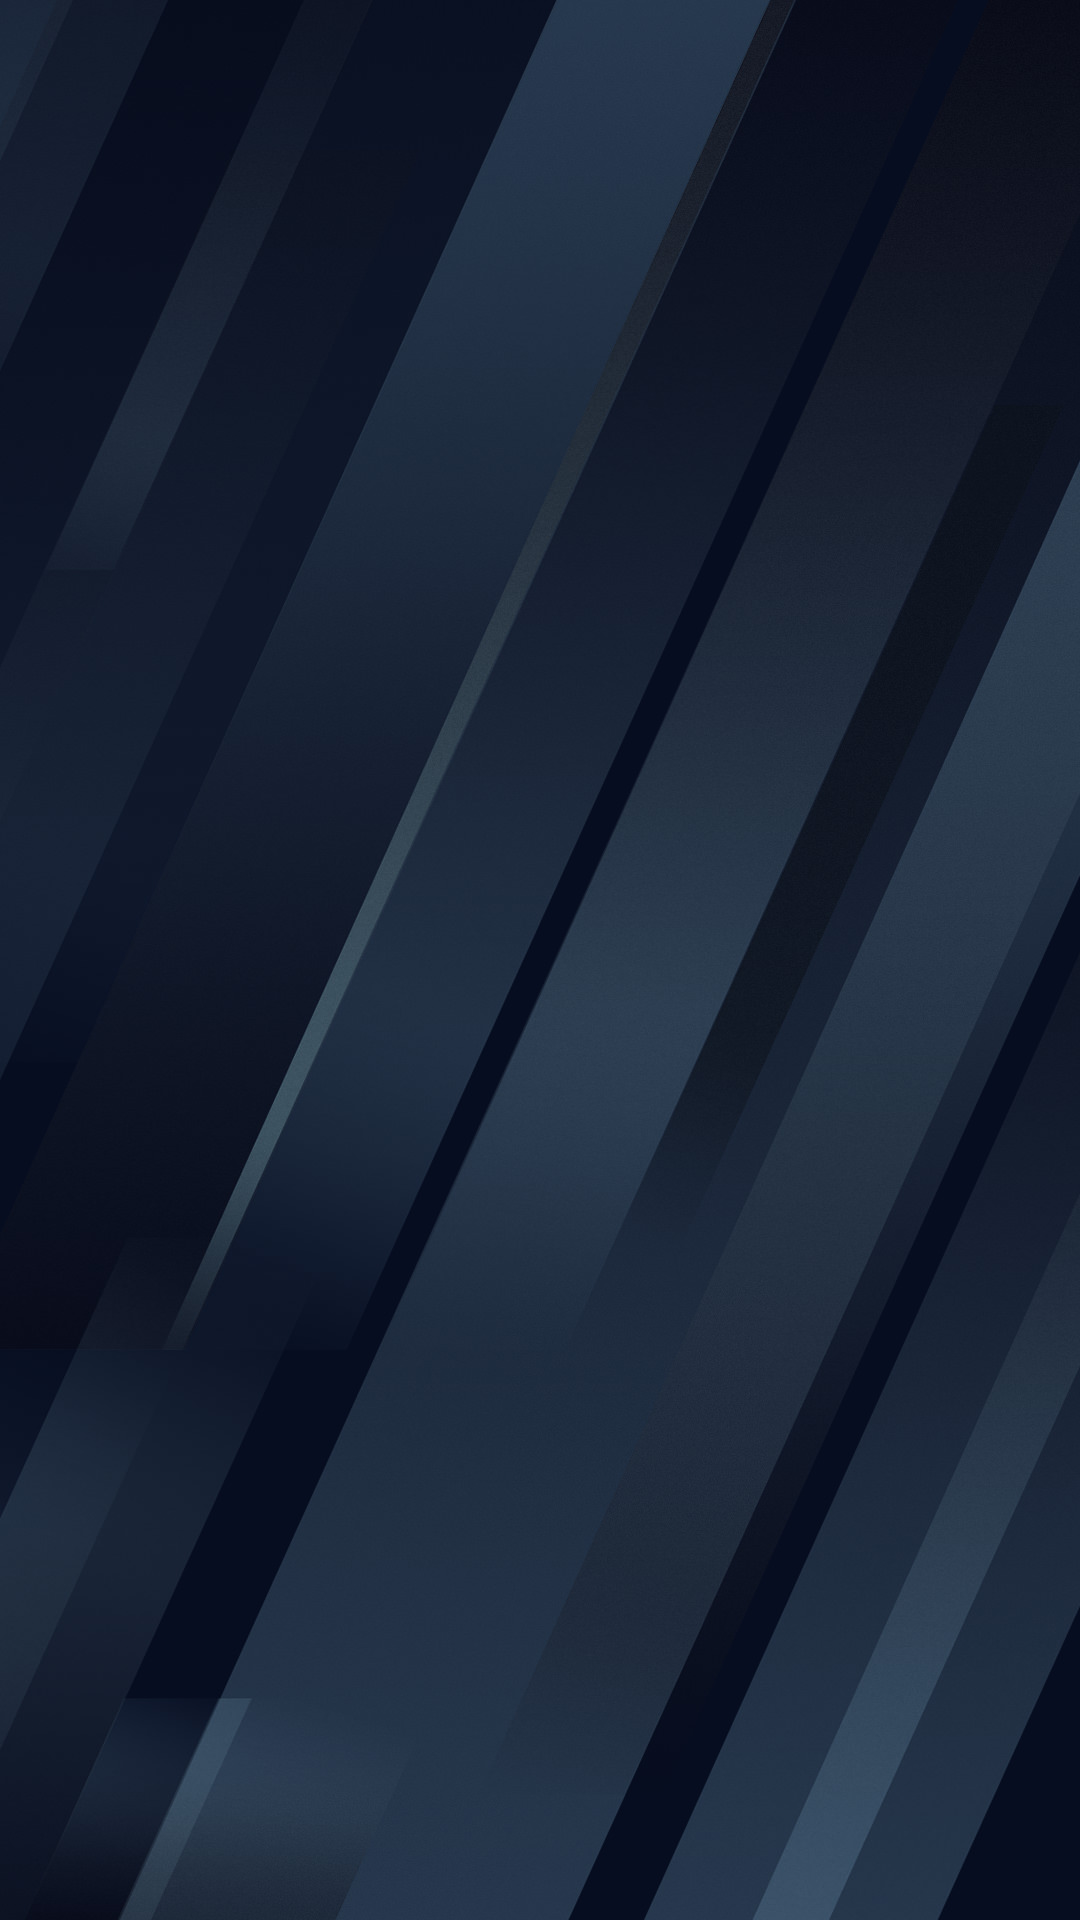 Iphone X Stock Wallpaper Zip Download Stock Wallpapers Of Lenovo Vibe X2 Pro